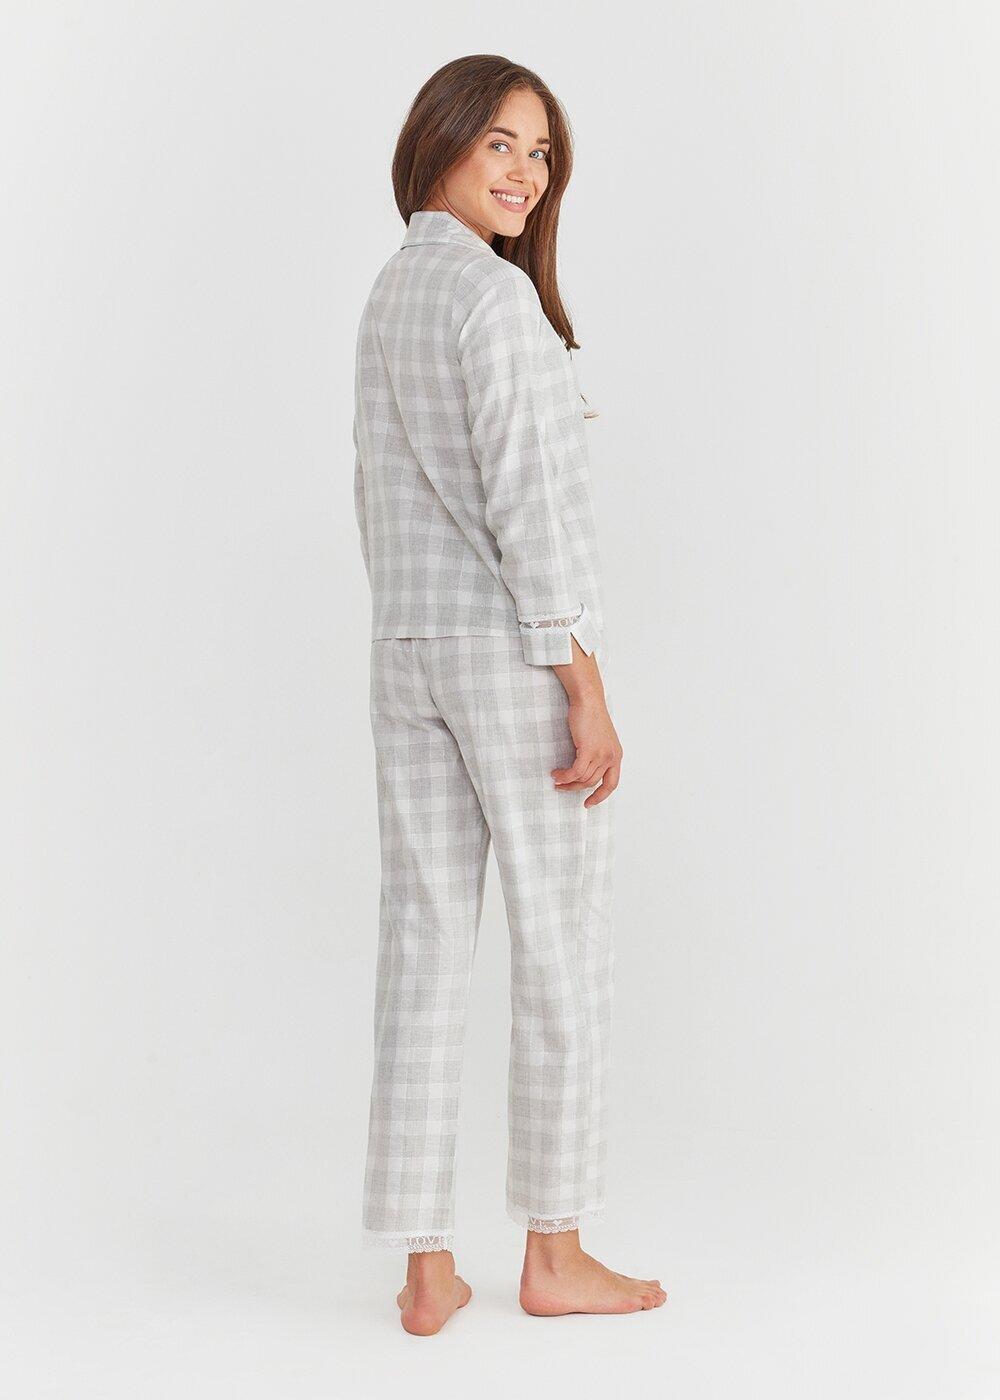 resm Sofia Maskulen Pijama Takımı - GRİ EKOSELİ